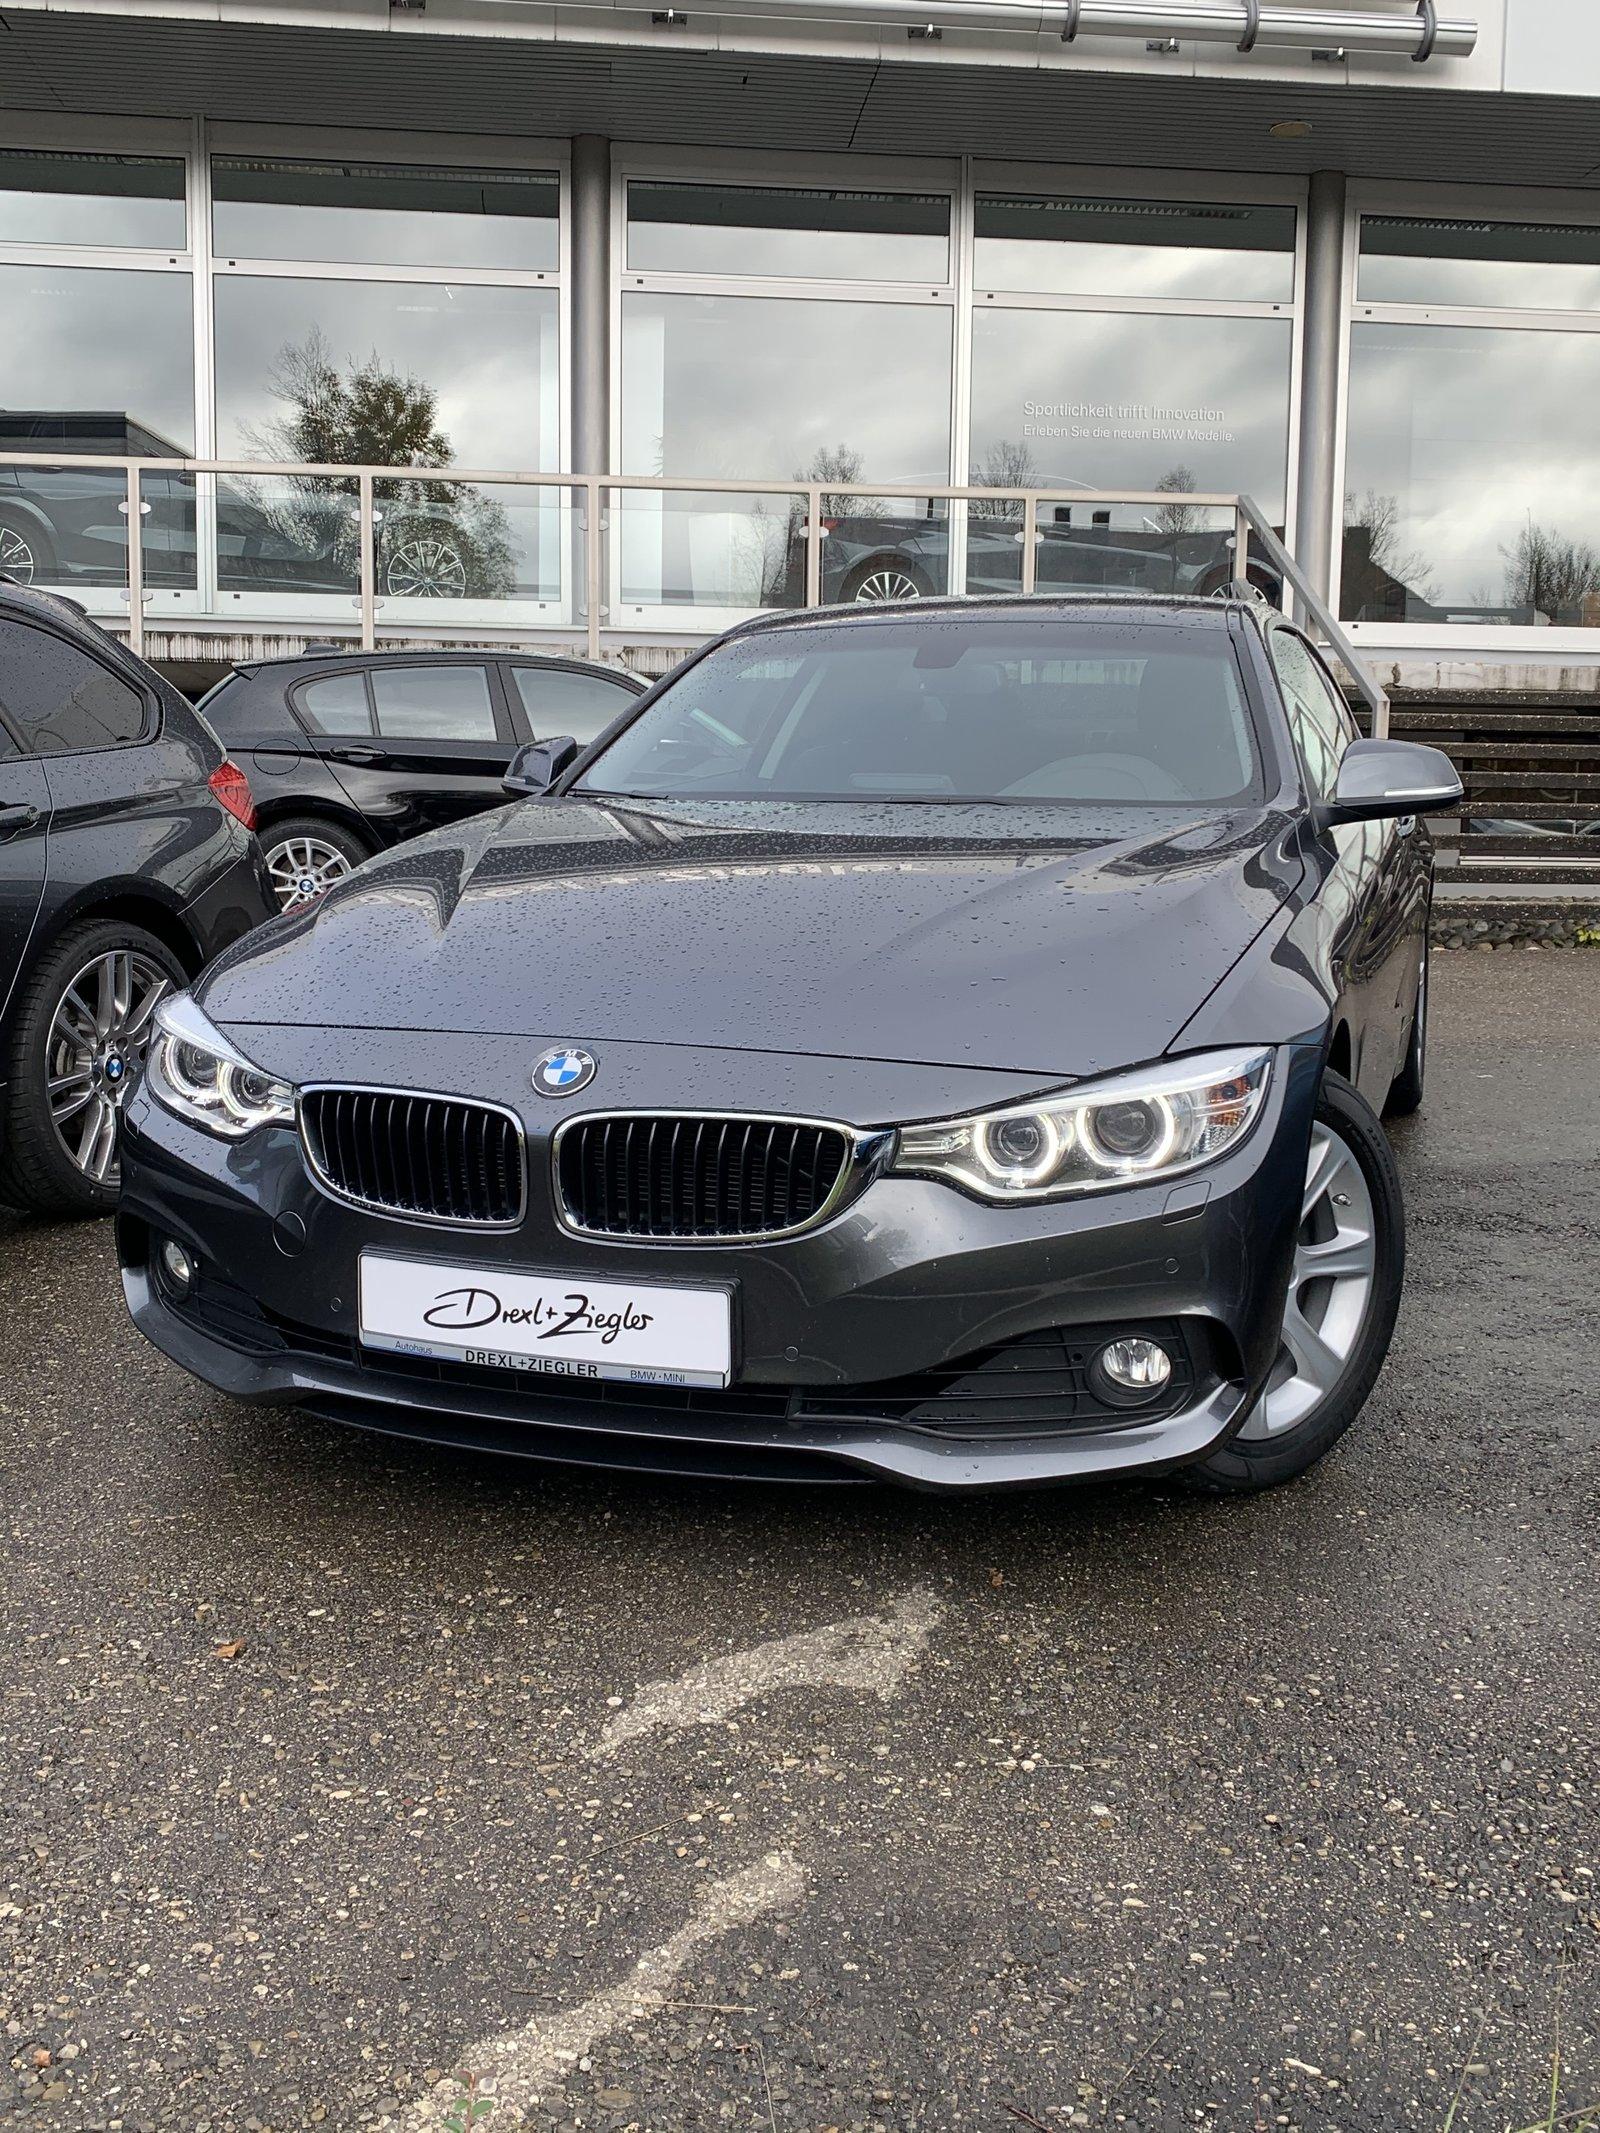 BMW 420i Coupe XENON NAVI PDC KLIMA HiFi LMR17, Jahr 2014, Benzin